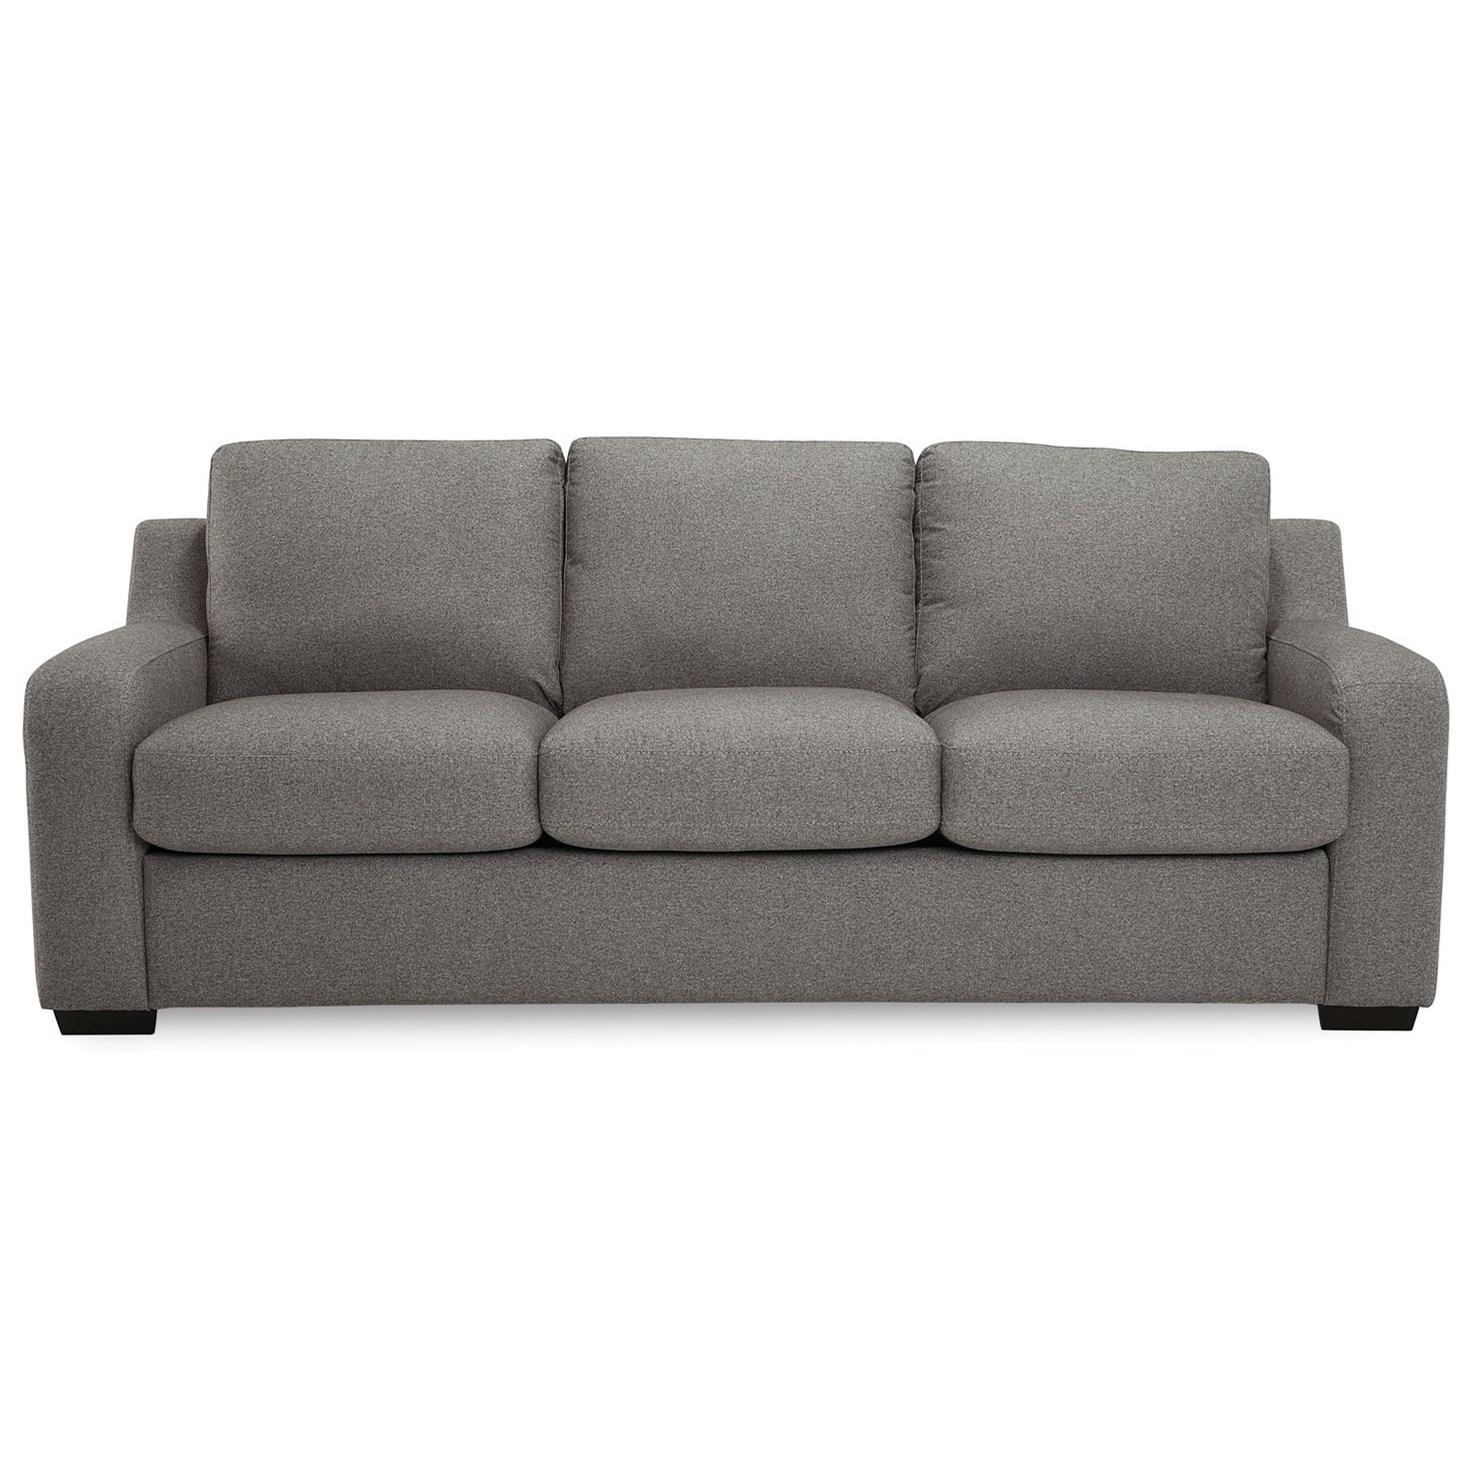 Palliser Flex Contemporary Queen Size Sofa Bed Story Lee